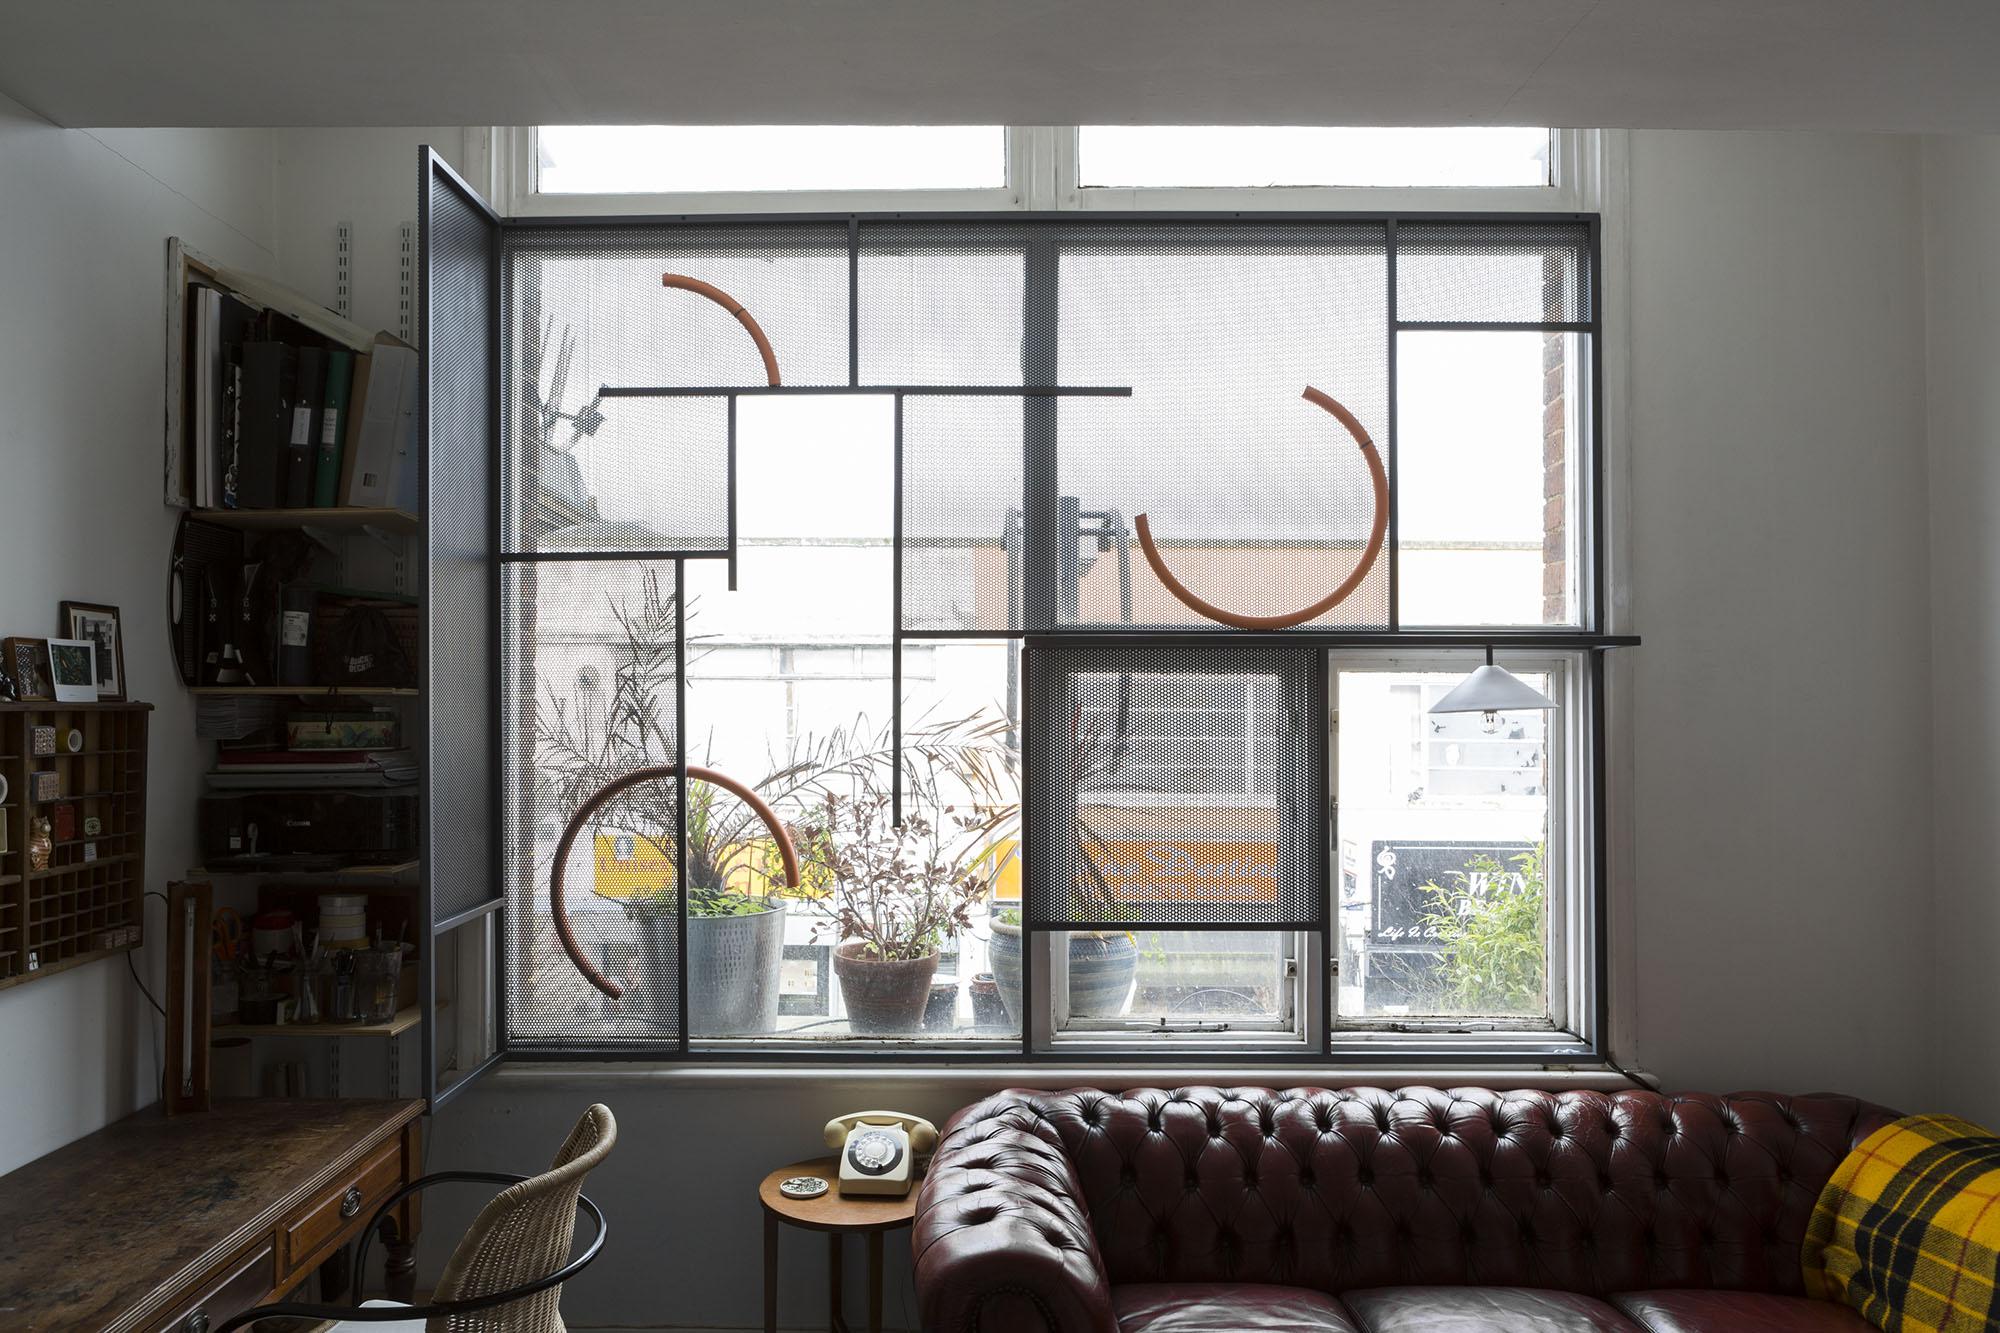 Window , 2014 Mild steel, plaster, lacquer, light bulb